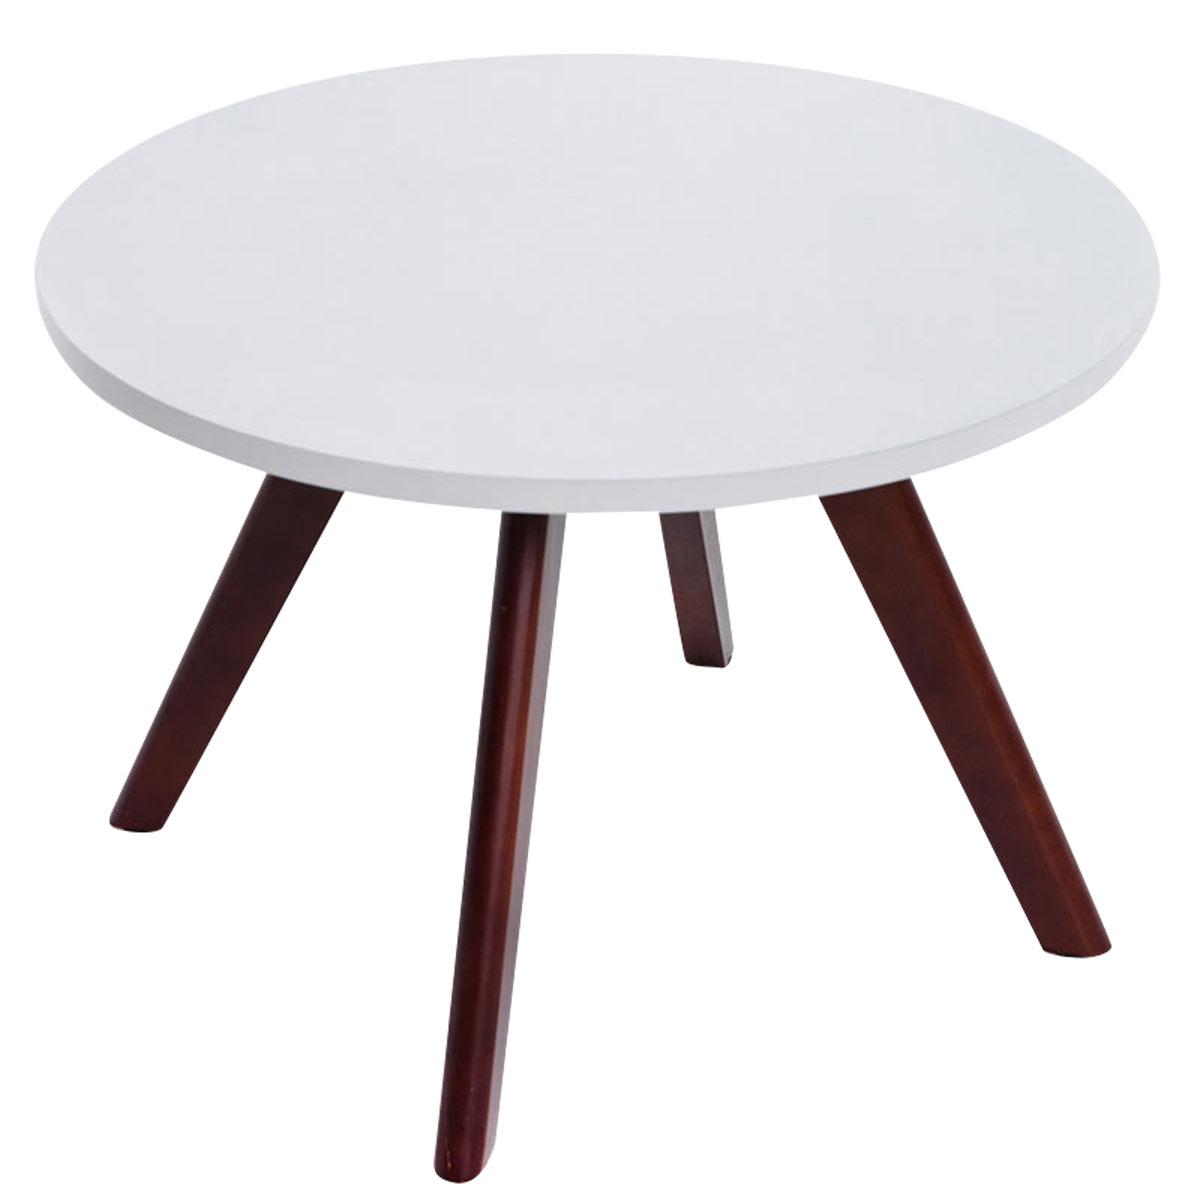 Konferenčný stolík Erik, 60 cm, nohy cappuccino, cappuccino / biela